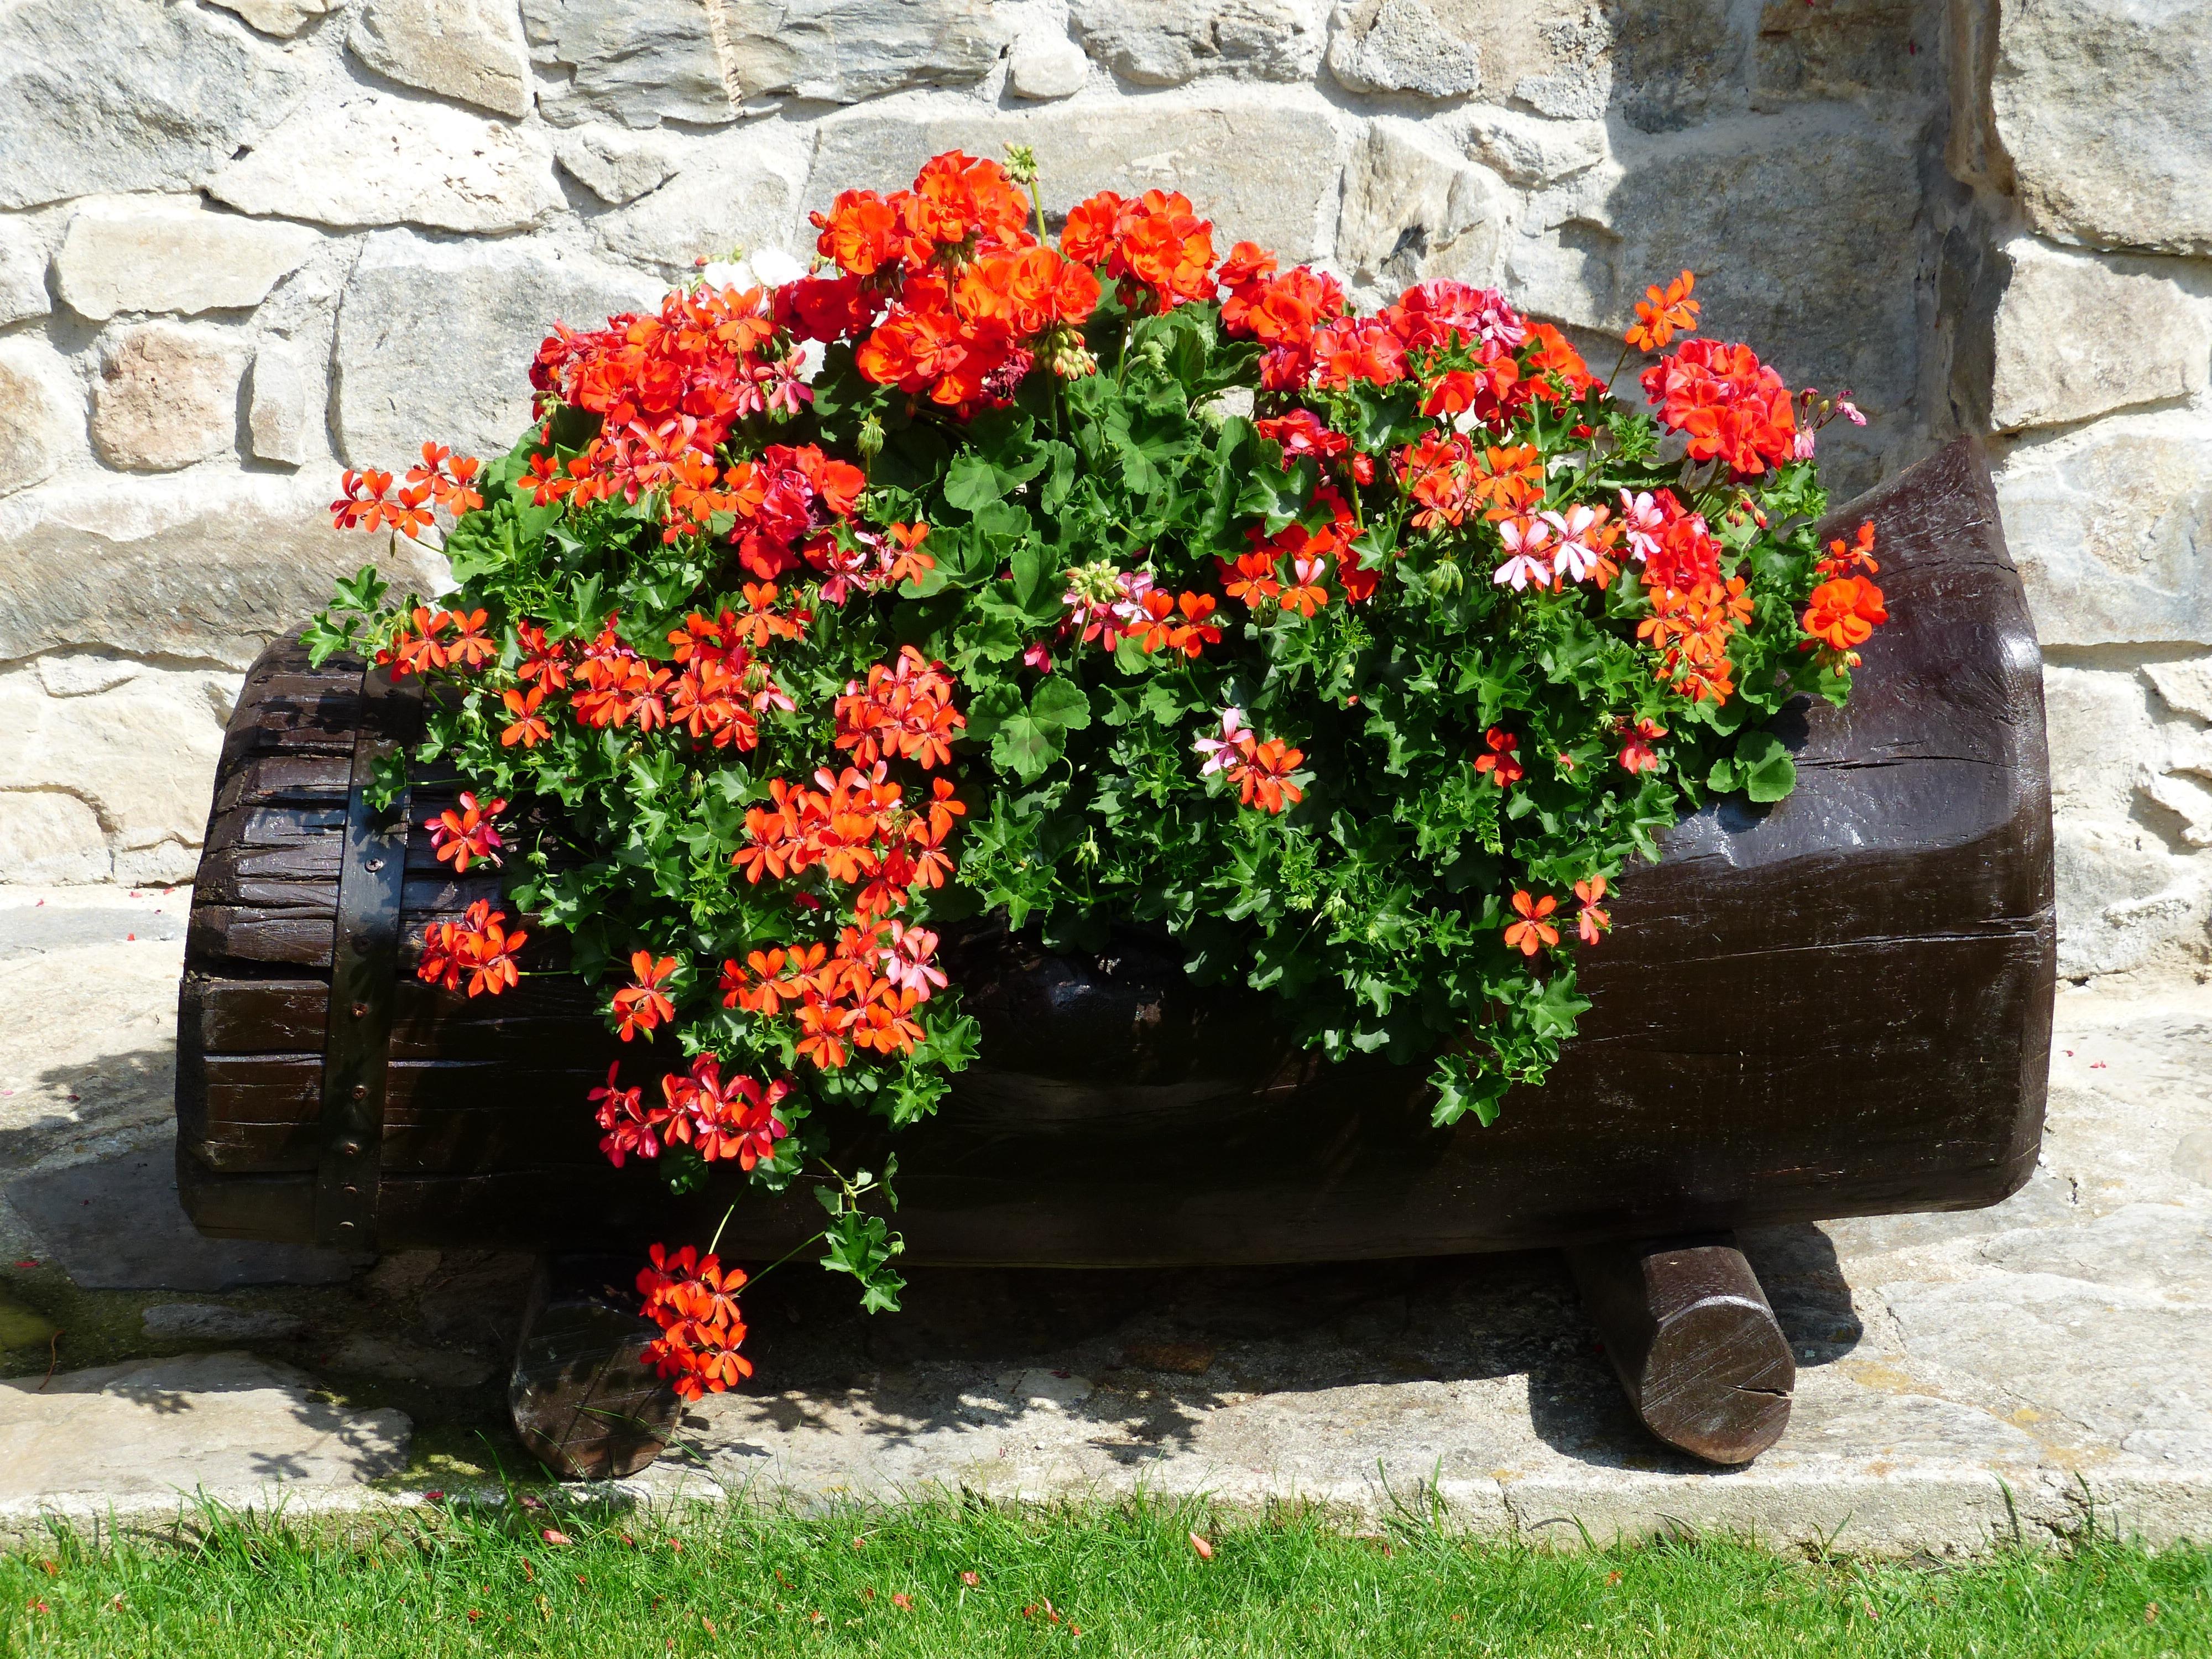 Fotos gratis flor naranja rojo color vistoso jard n for Arbol rojo jardin